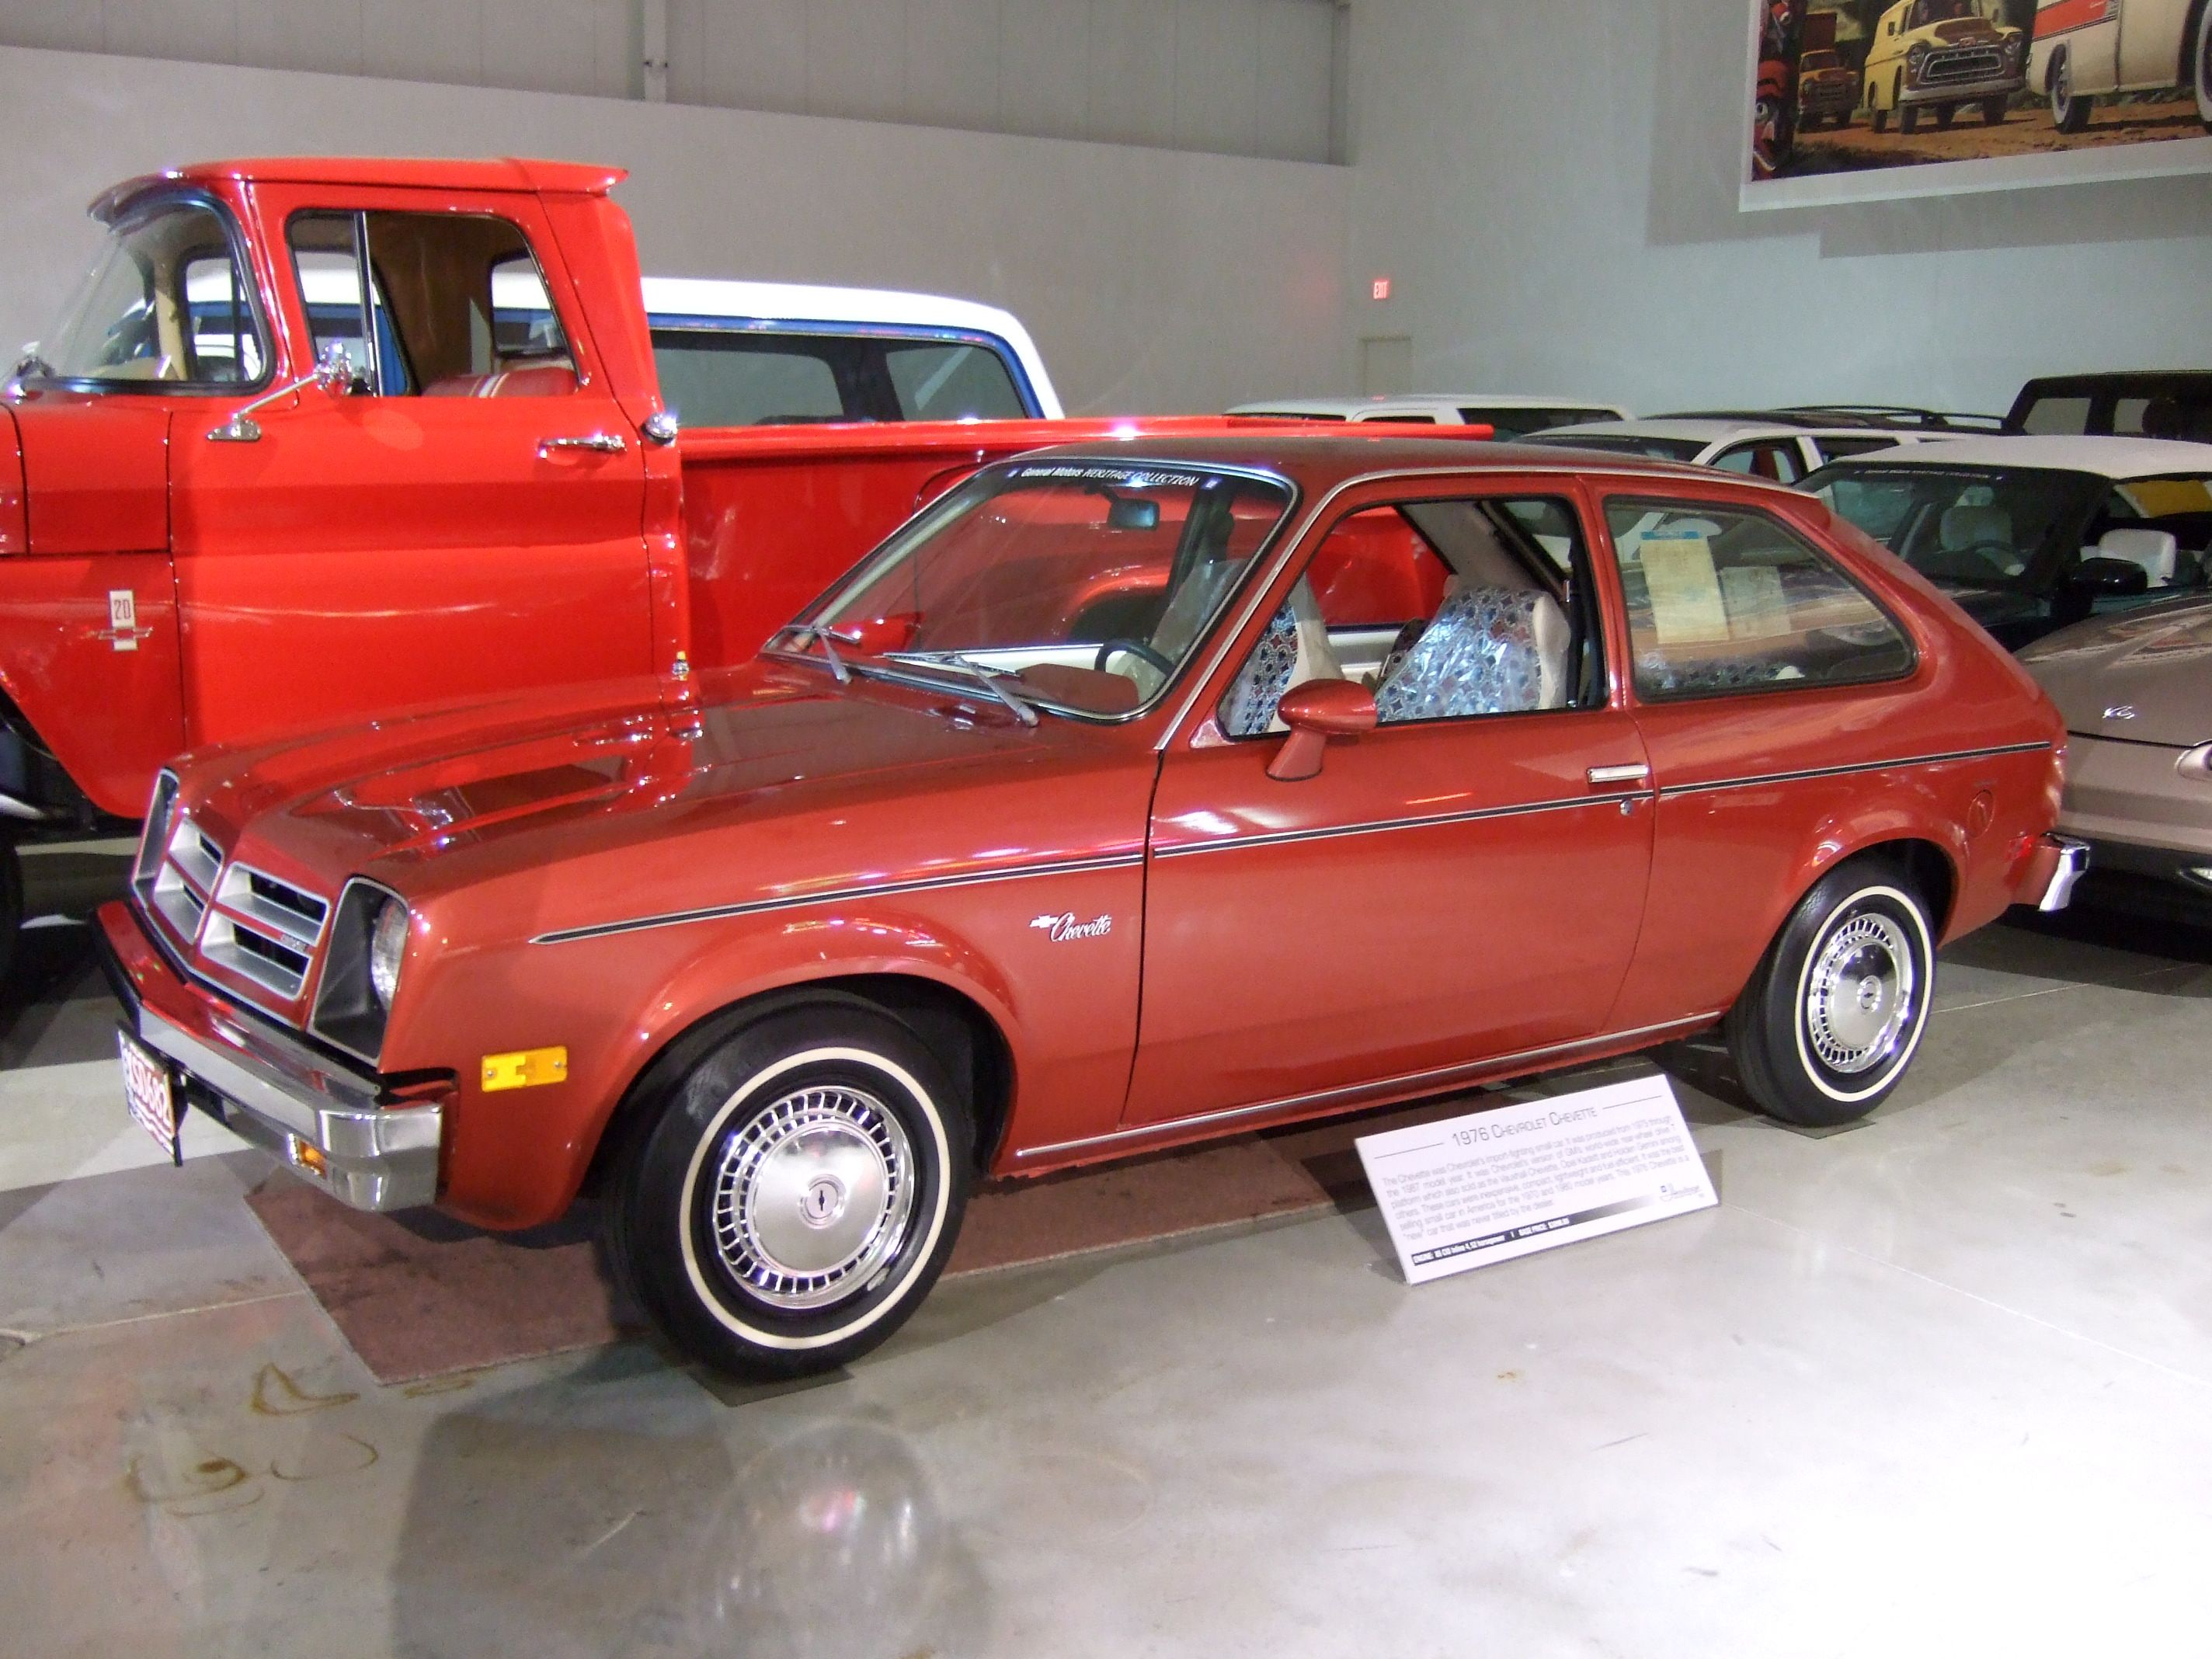 photo: CHEVY CHEVETTE | Worst Cars Ever | Pinterest | Rear wheel ...